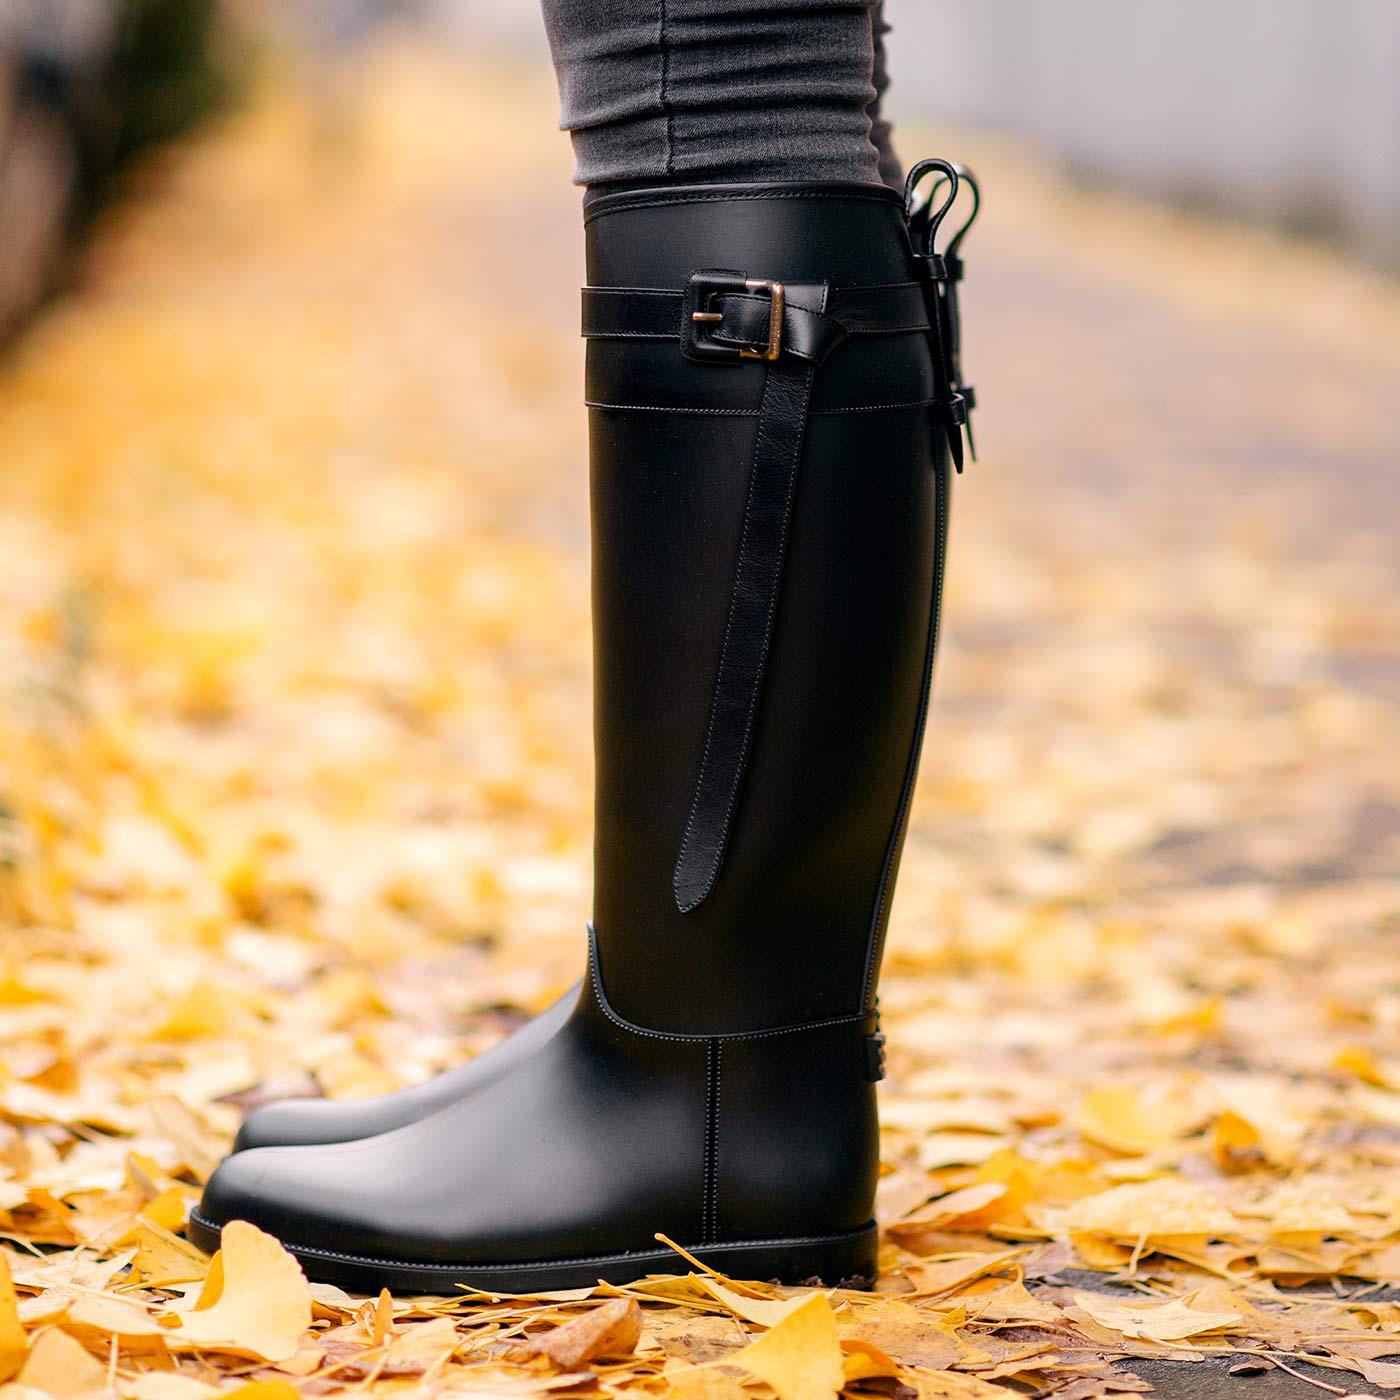 burberry-rain-boots-005